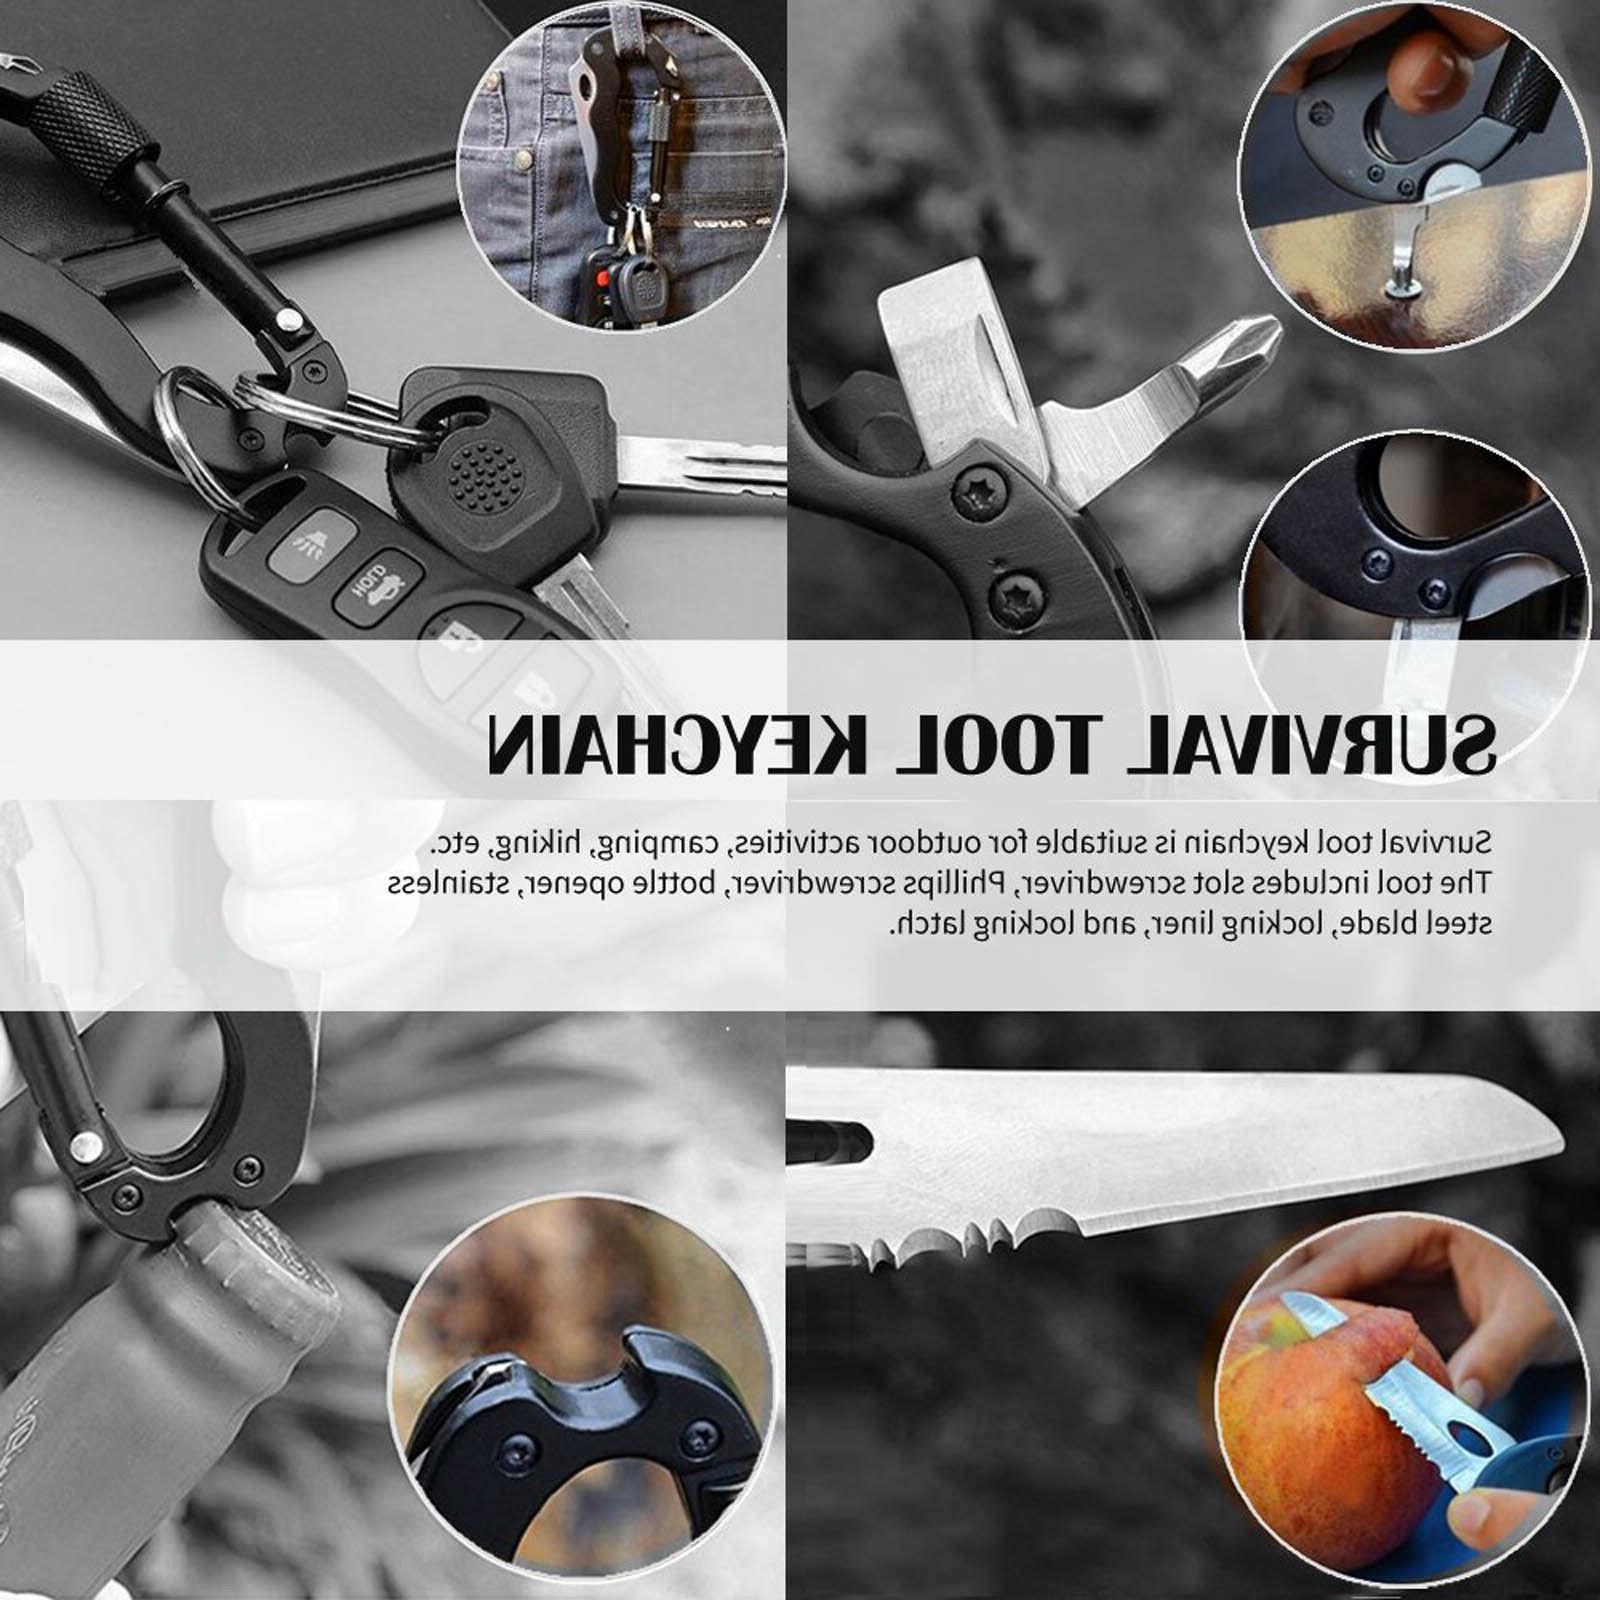 Survival EDC Gear Carabiner Keychain Holder B